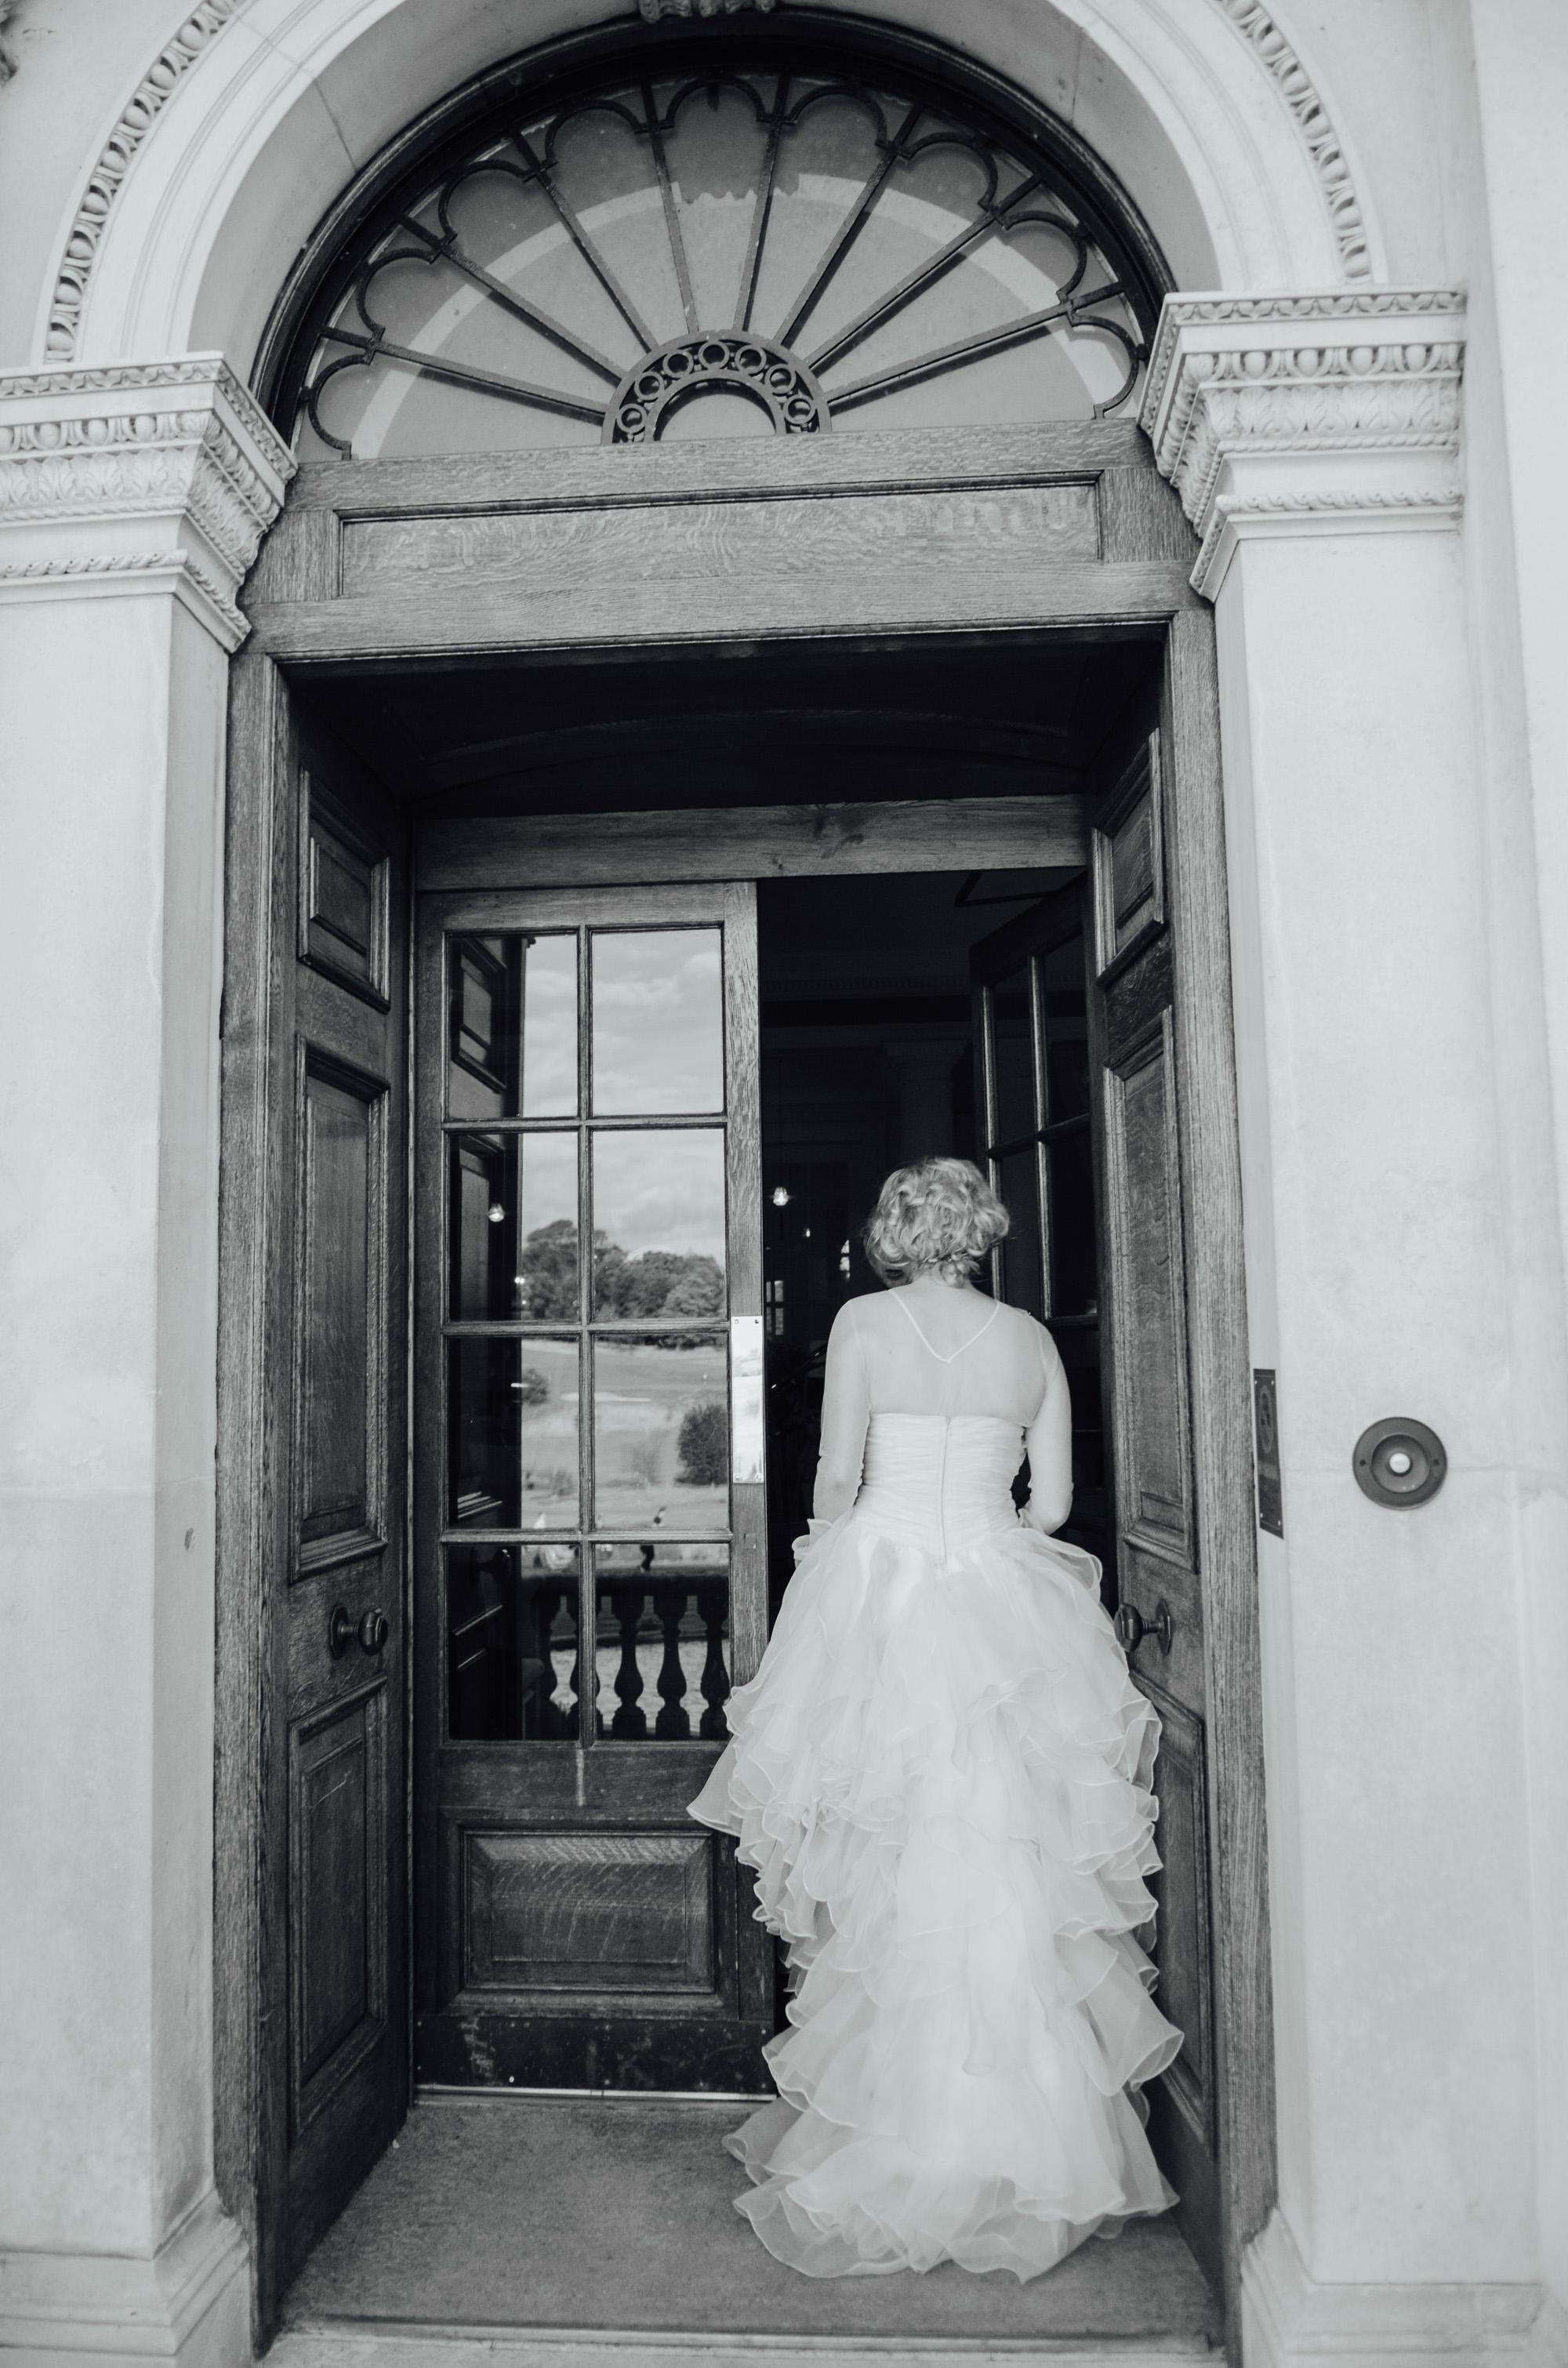 cleland-studios-wedding-photography-74.jpg